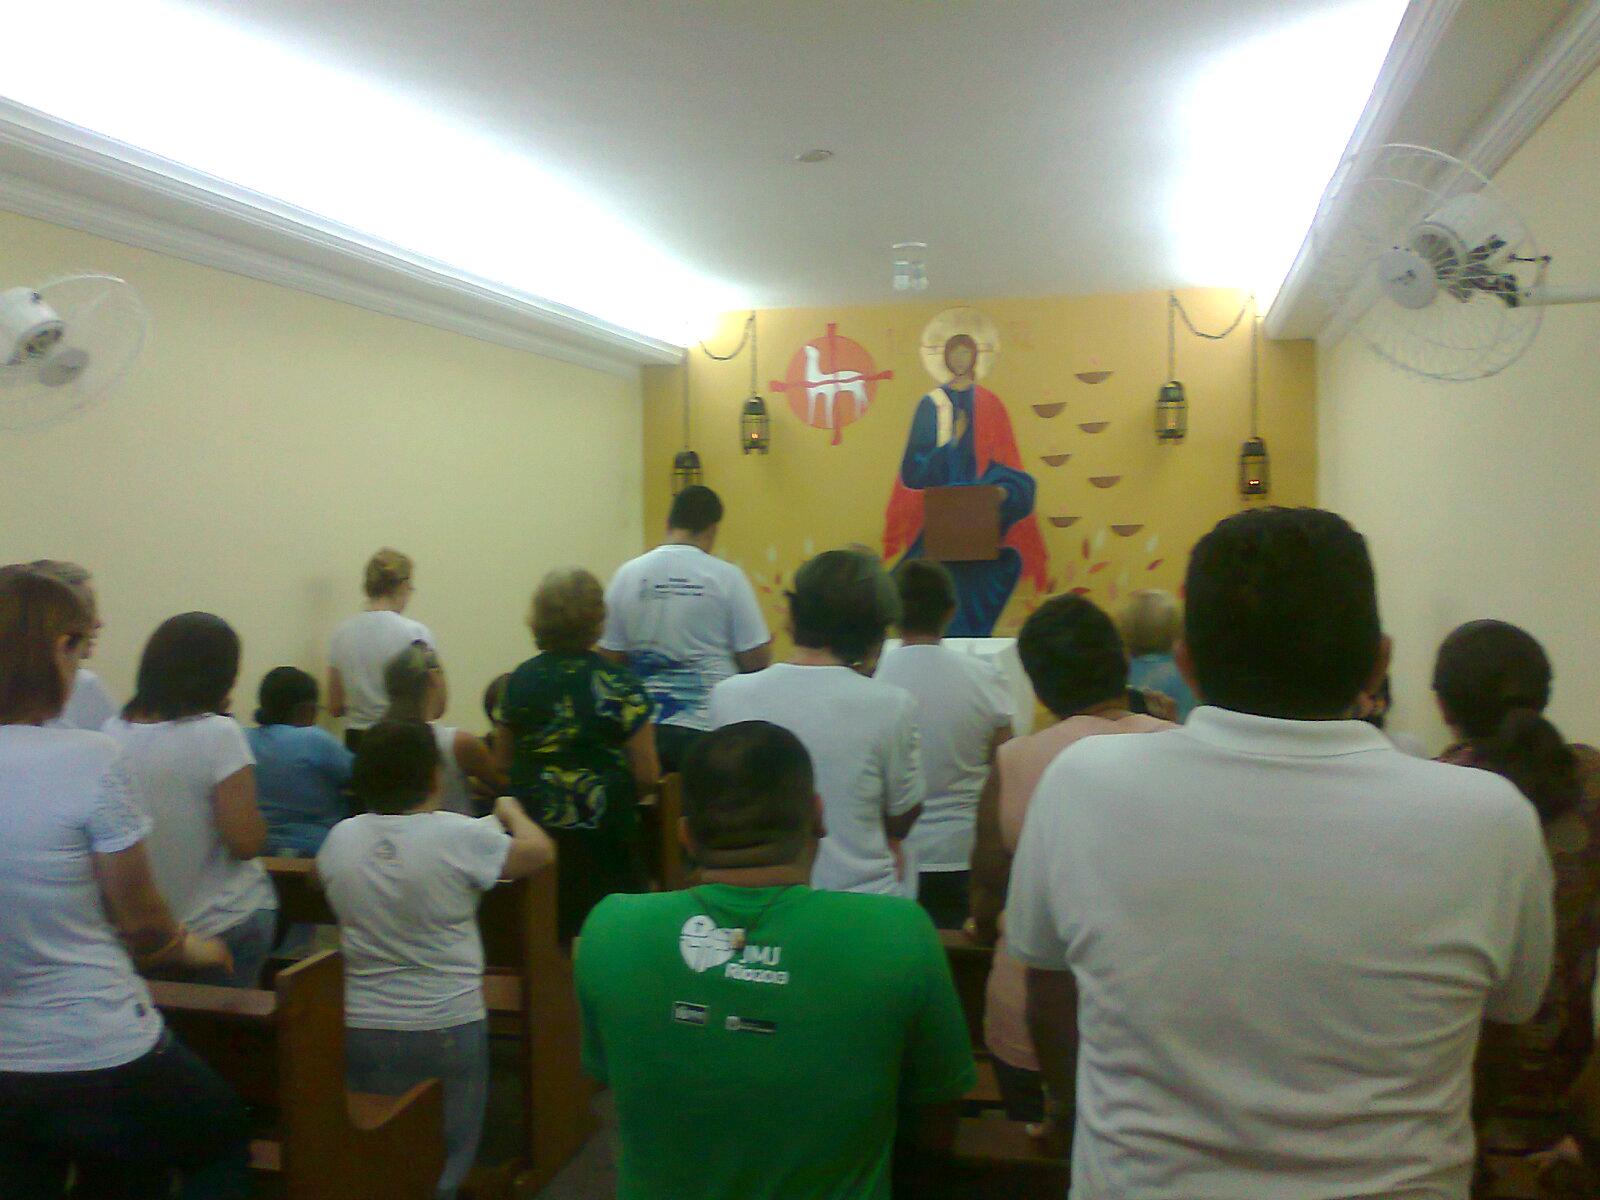 Capela Matriz de Pacajus, Igreja em Pacajus, Padroeira de Pacajus